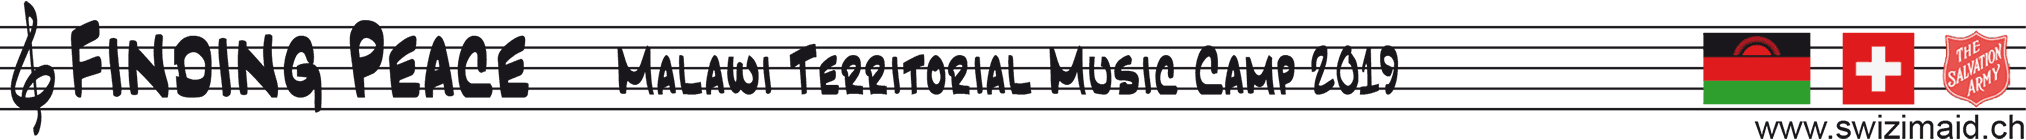 Malawi Territorial Music Camp 2019 Logo